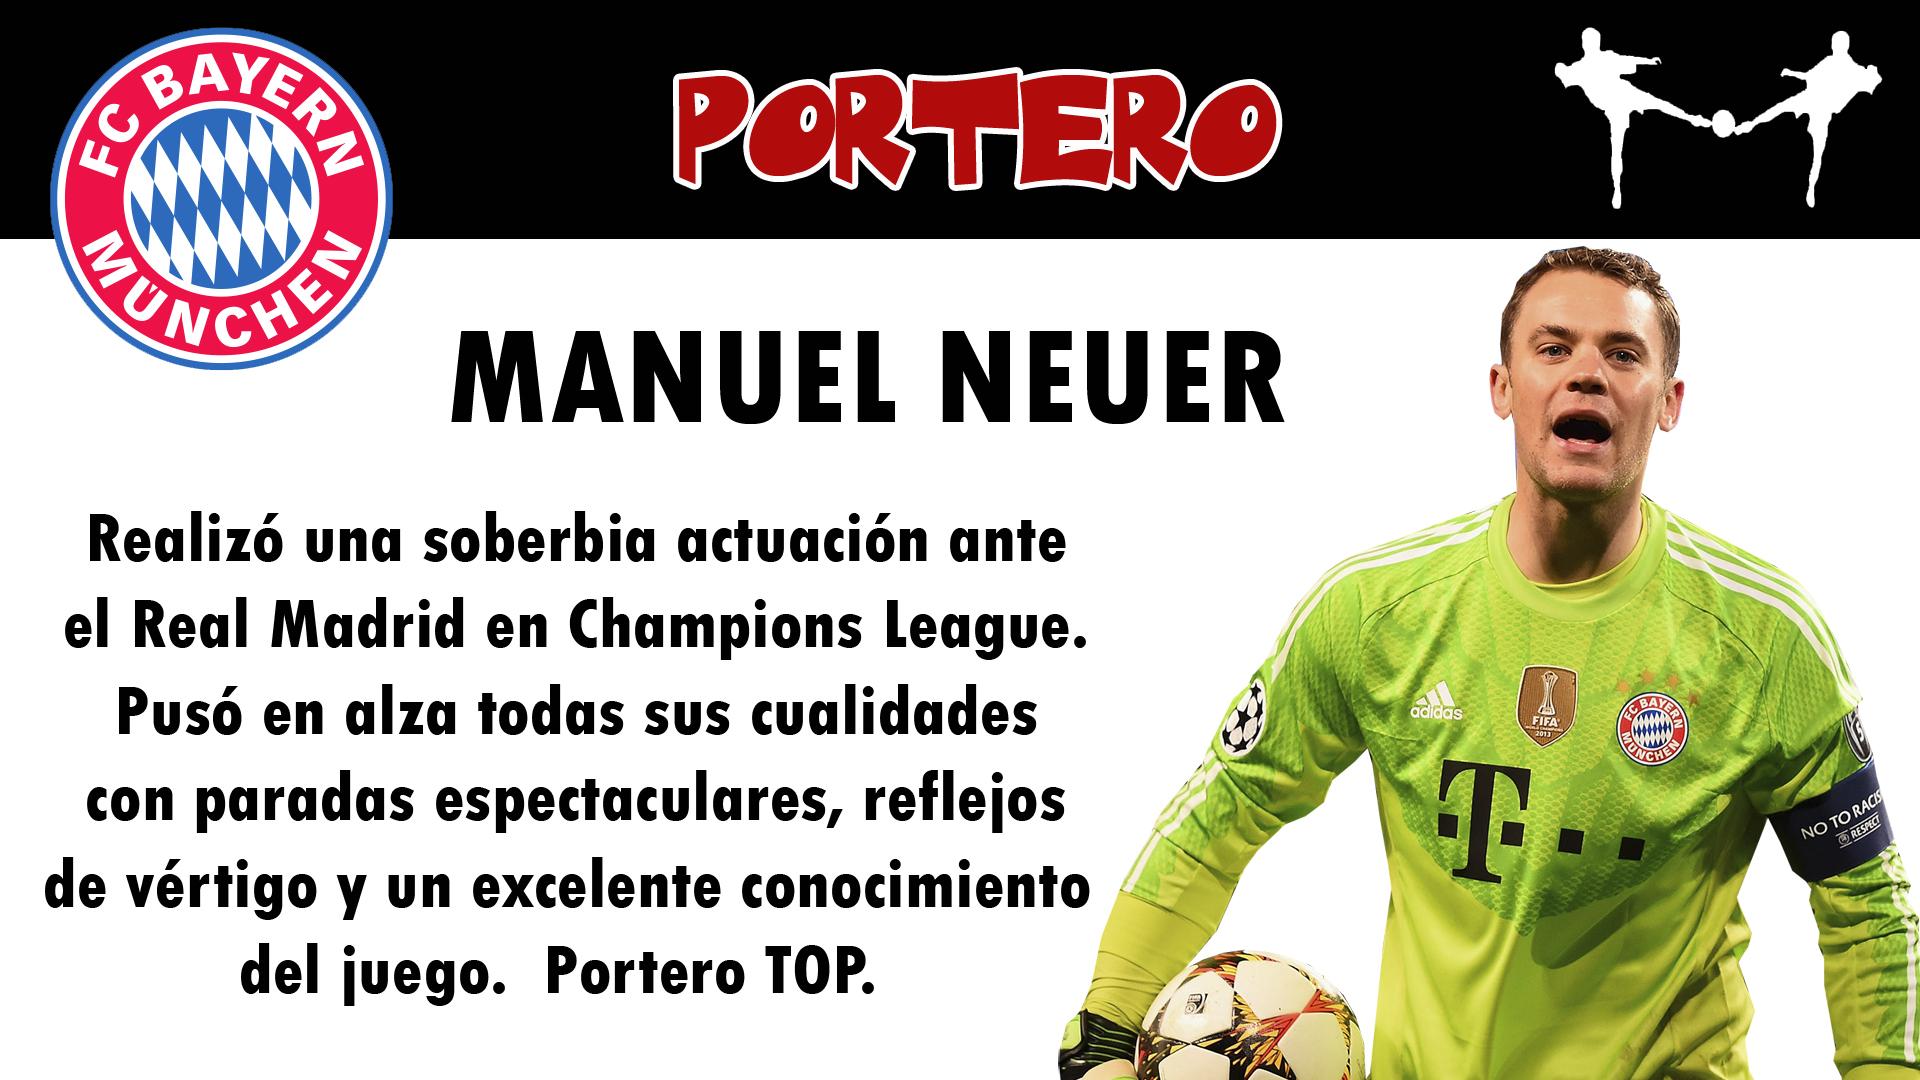 futbolcarrasco bayern munich manuel neuer portero